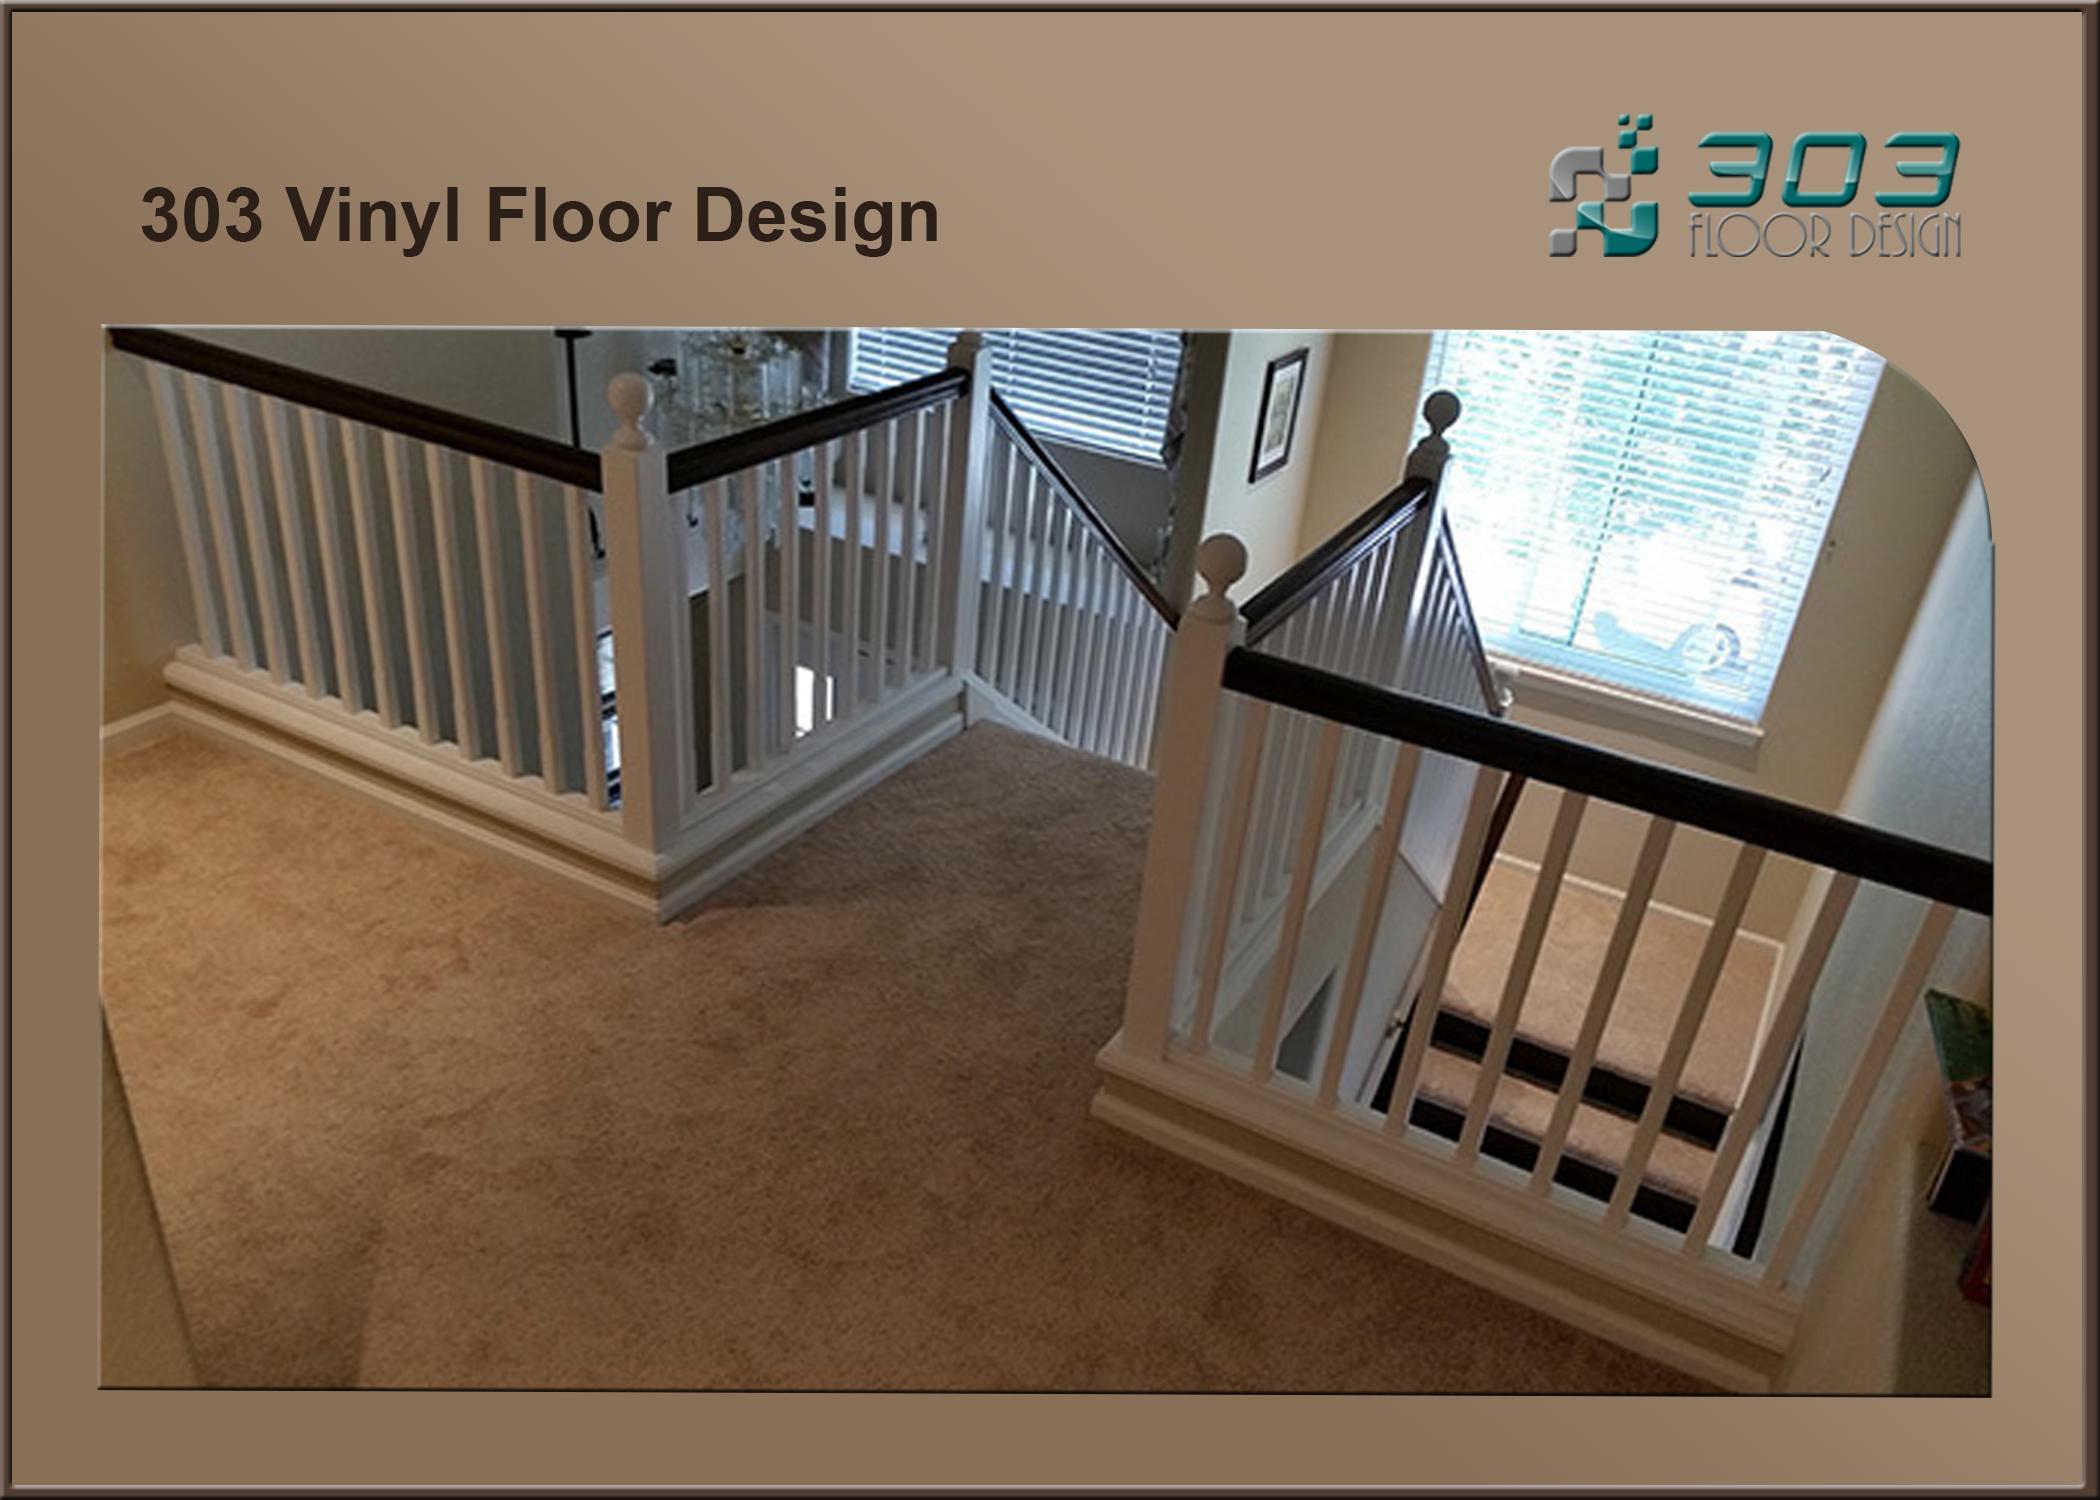 303floordesign Offers Carpetvinylflooringinstallation Denver Which Are Inexpensive Comfortable Vinyl Flooring Installation Vinyl Flooring Flooring Options